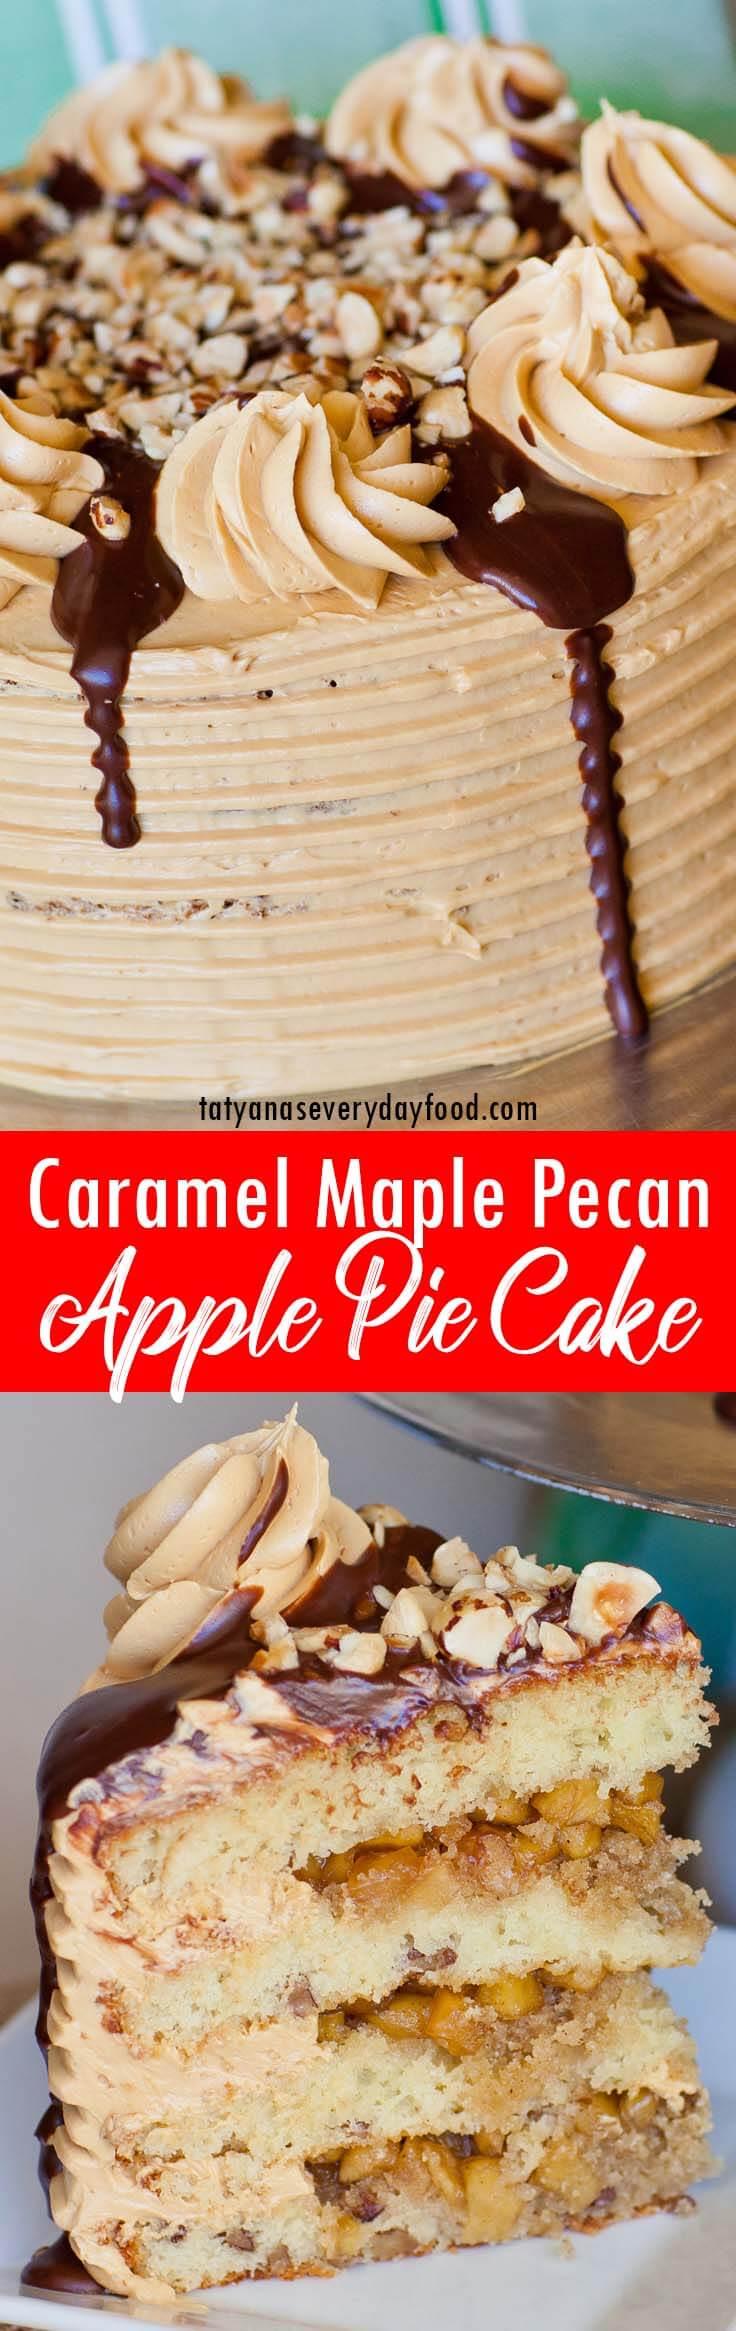 Apple Pie Maple Pecan Cake video recipe